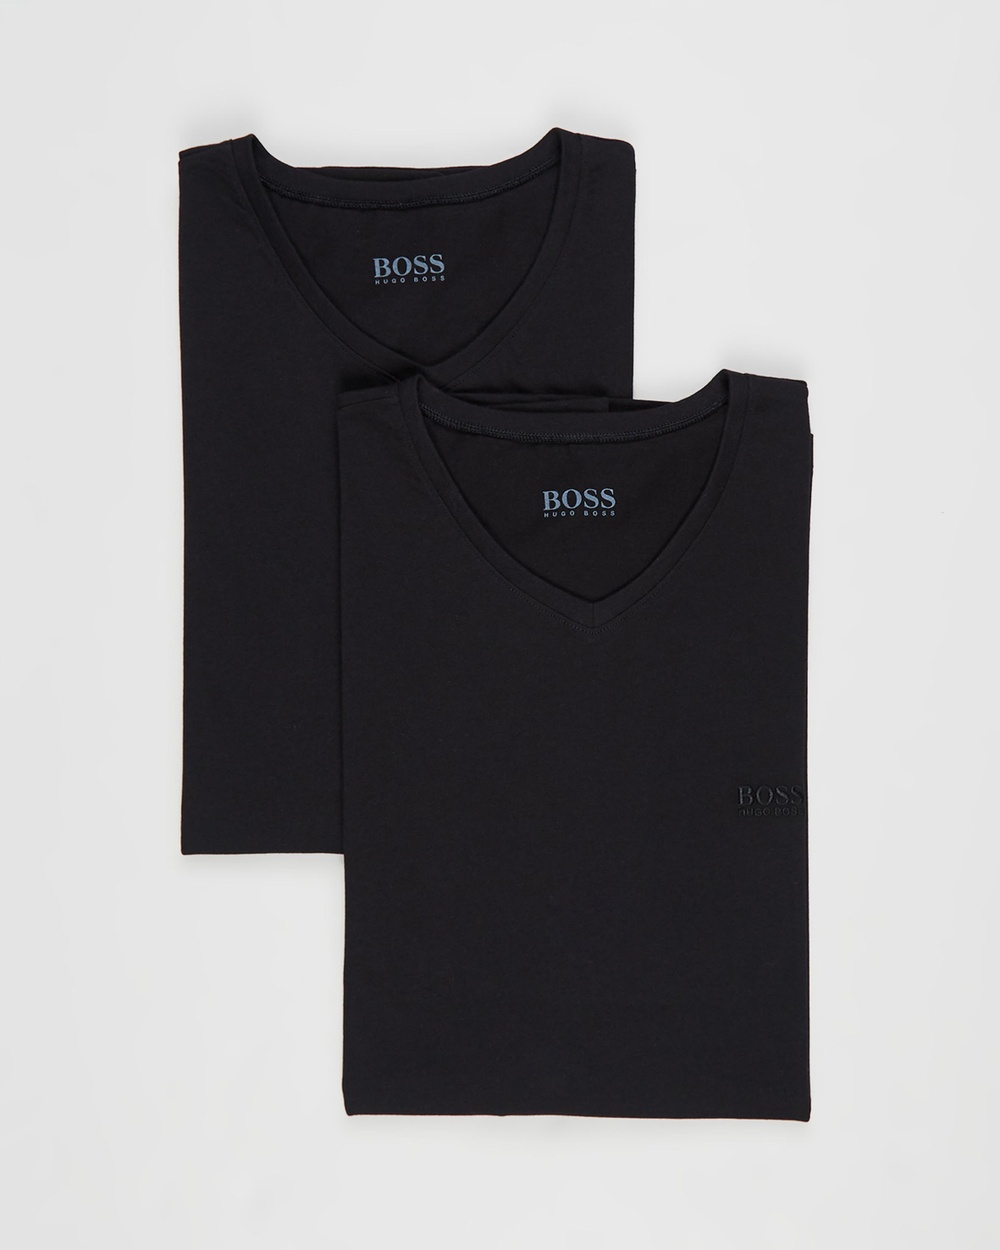 BOSS V Neck T Shirts 2 Pack T-Shirts & Singlets Black V-Neck 2-Pack